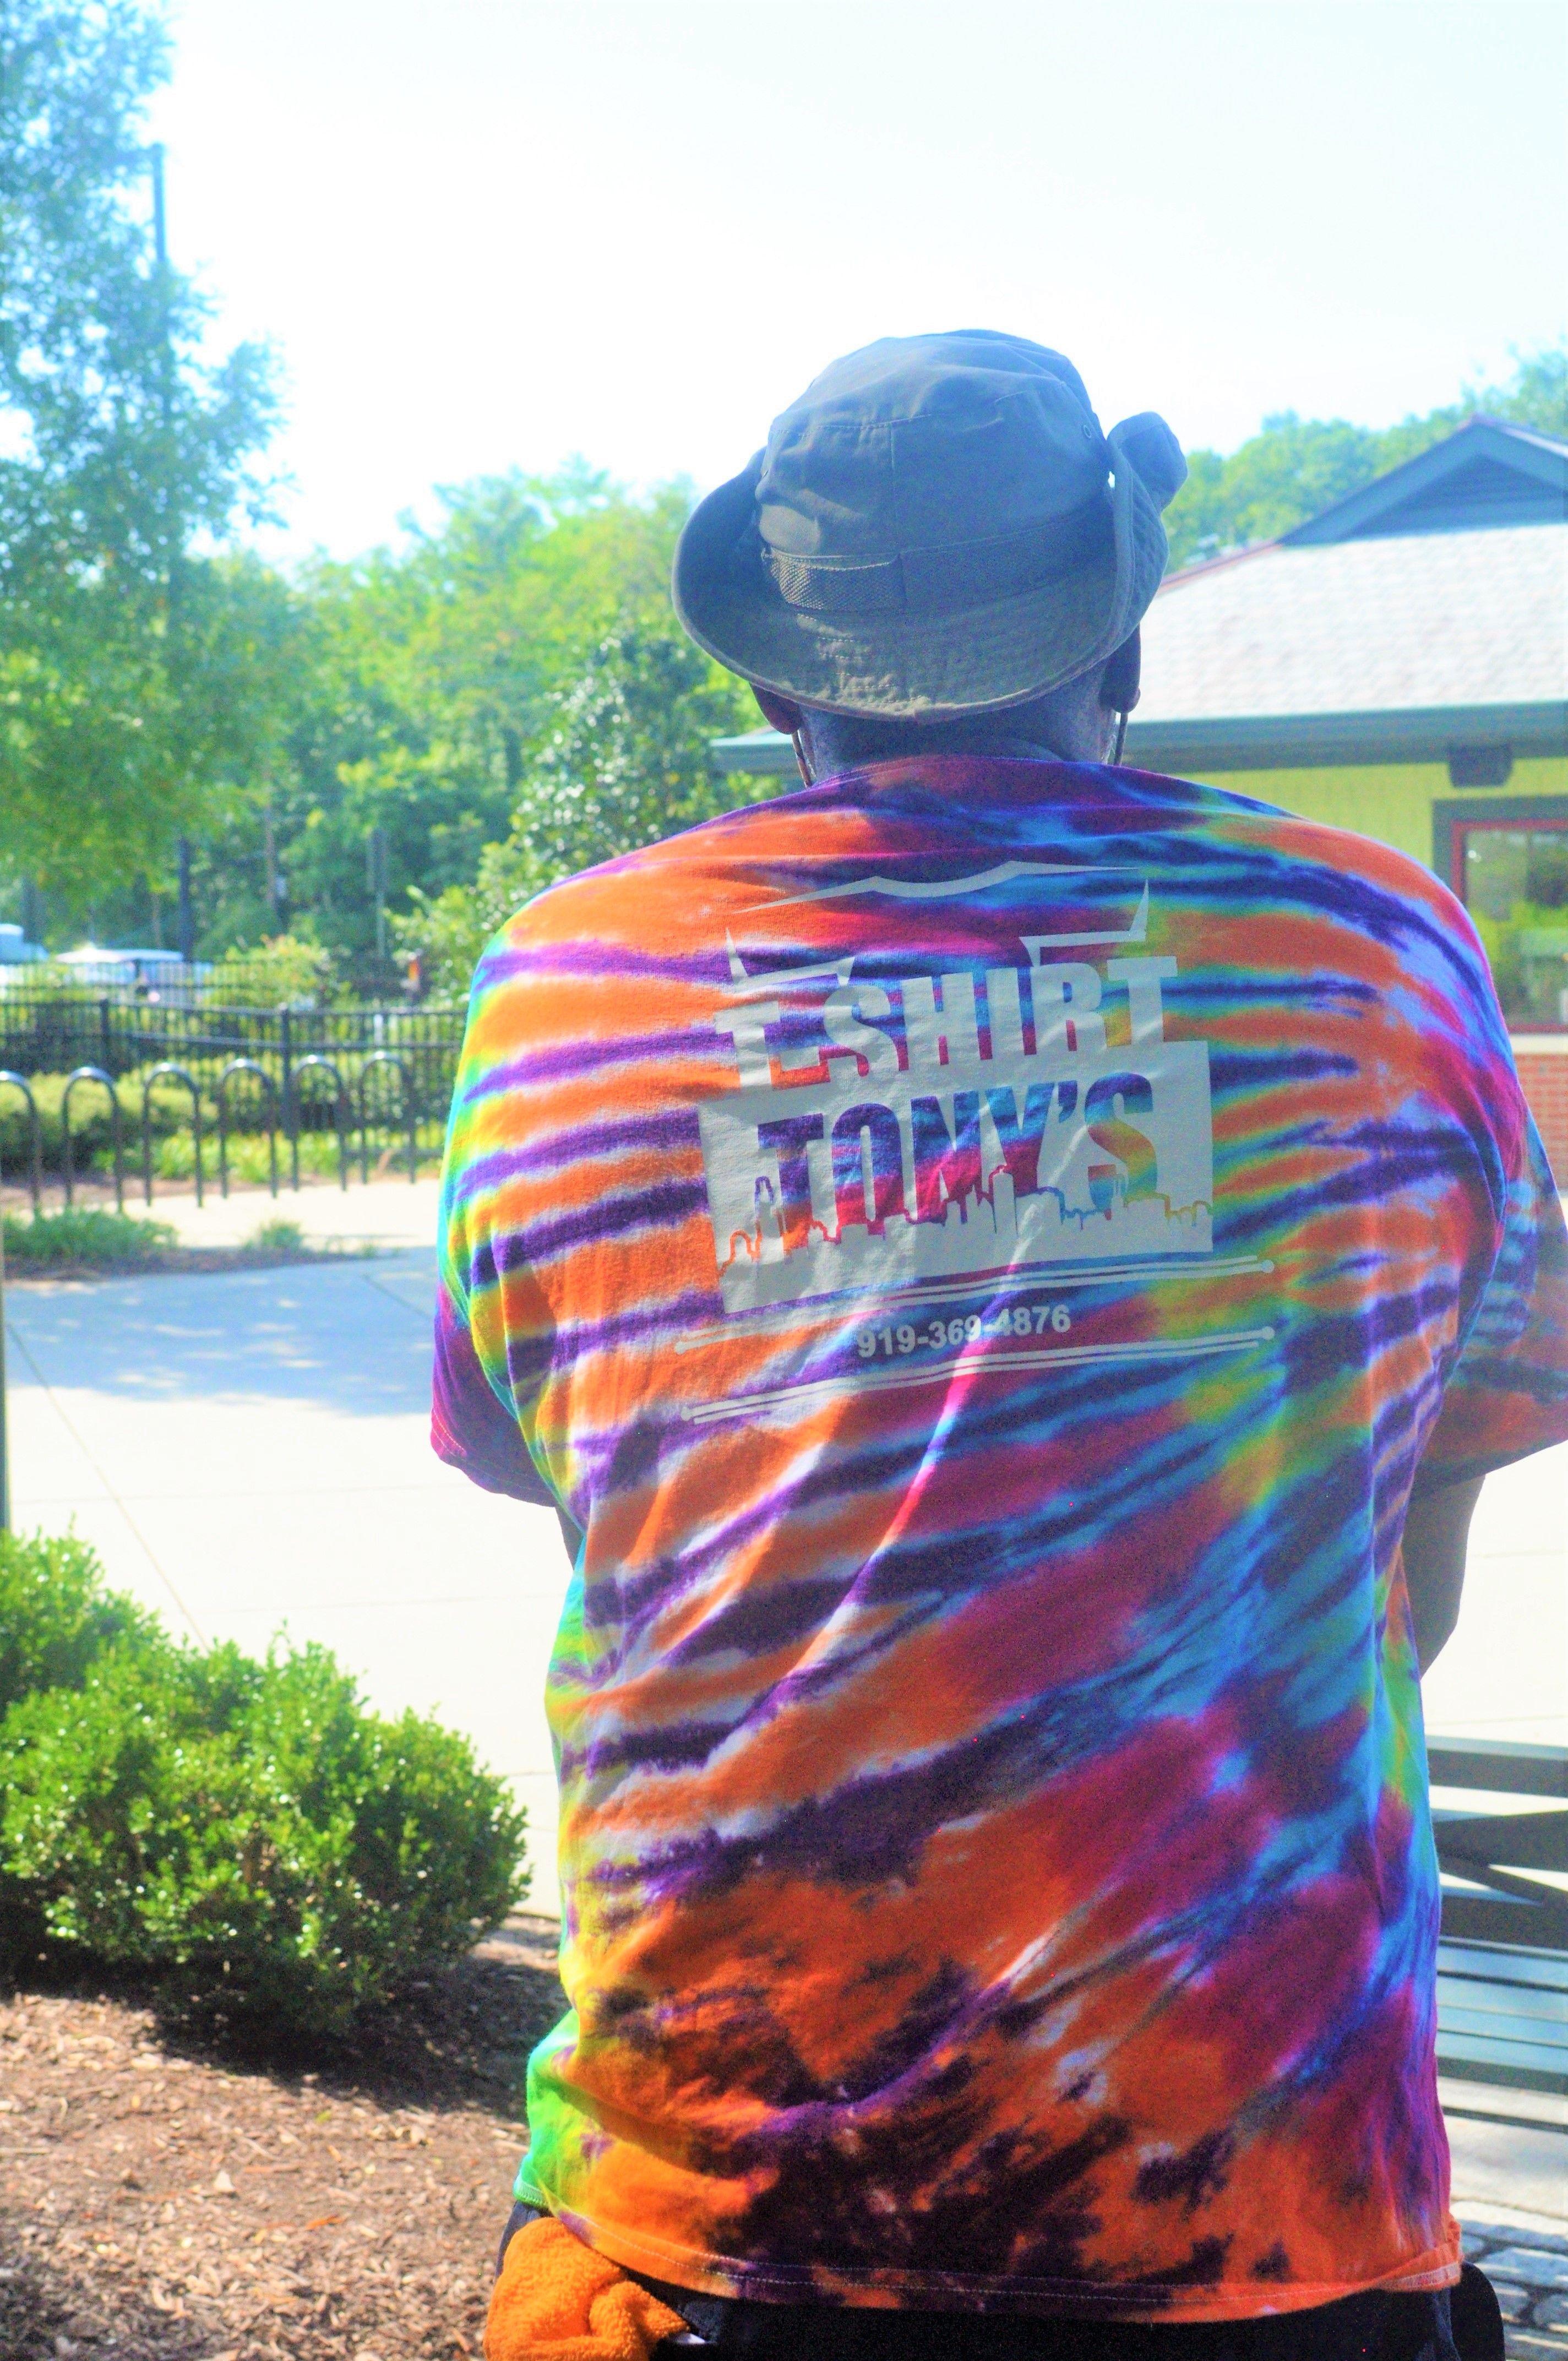 8ffbbf168 T-shirt Tony's Custom ApparelRaleigh Durham Chapel Hill   T-shirt Tony